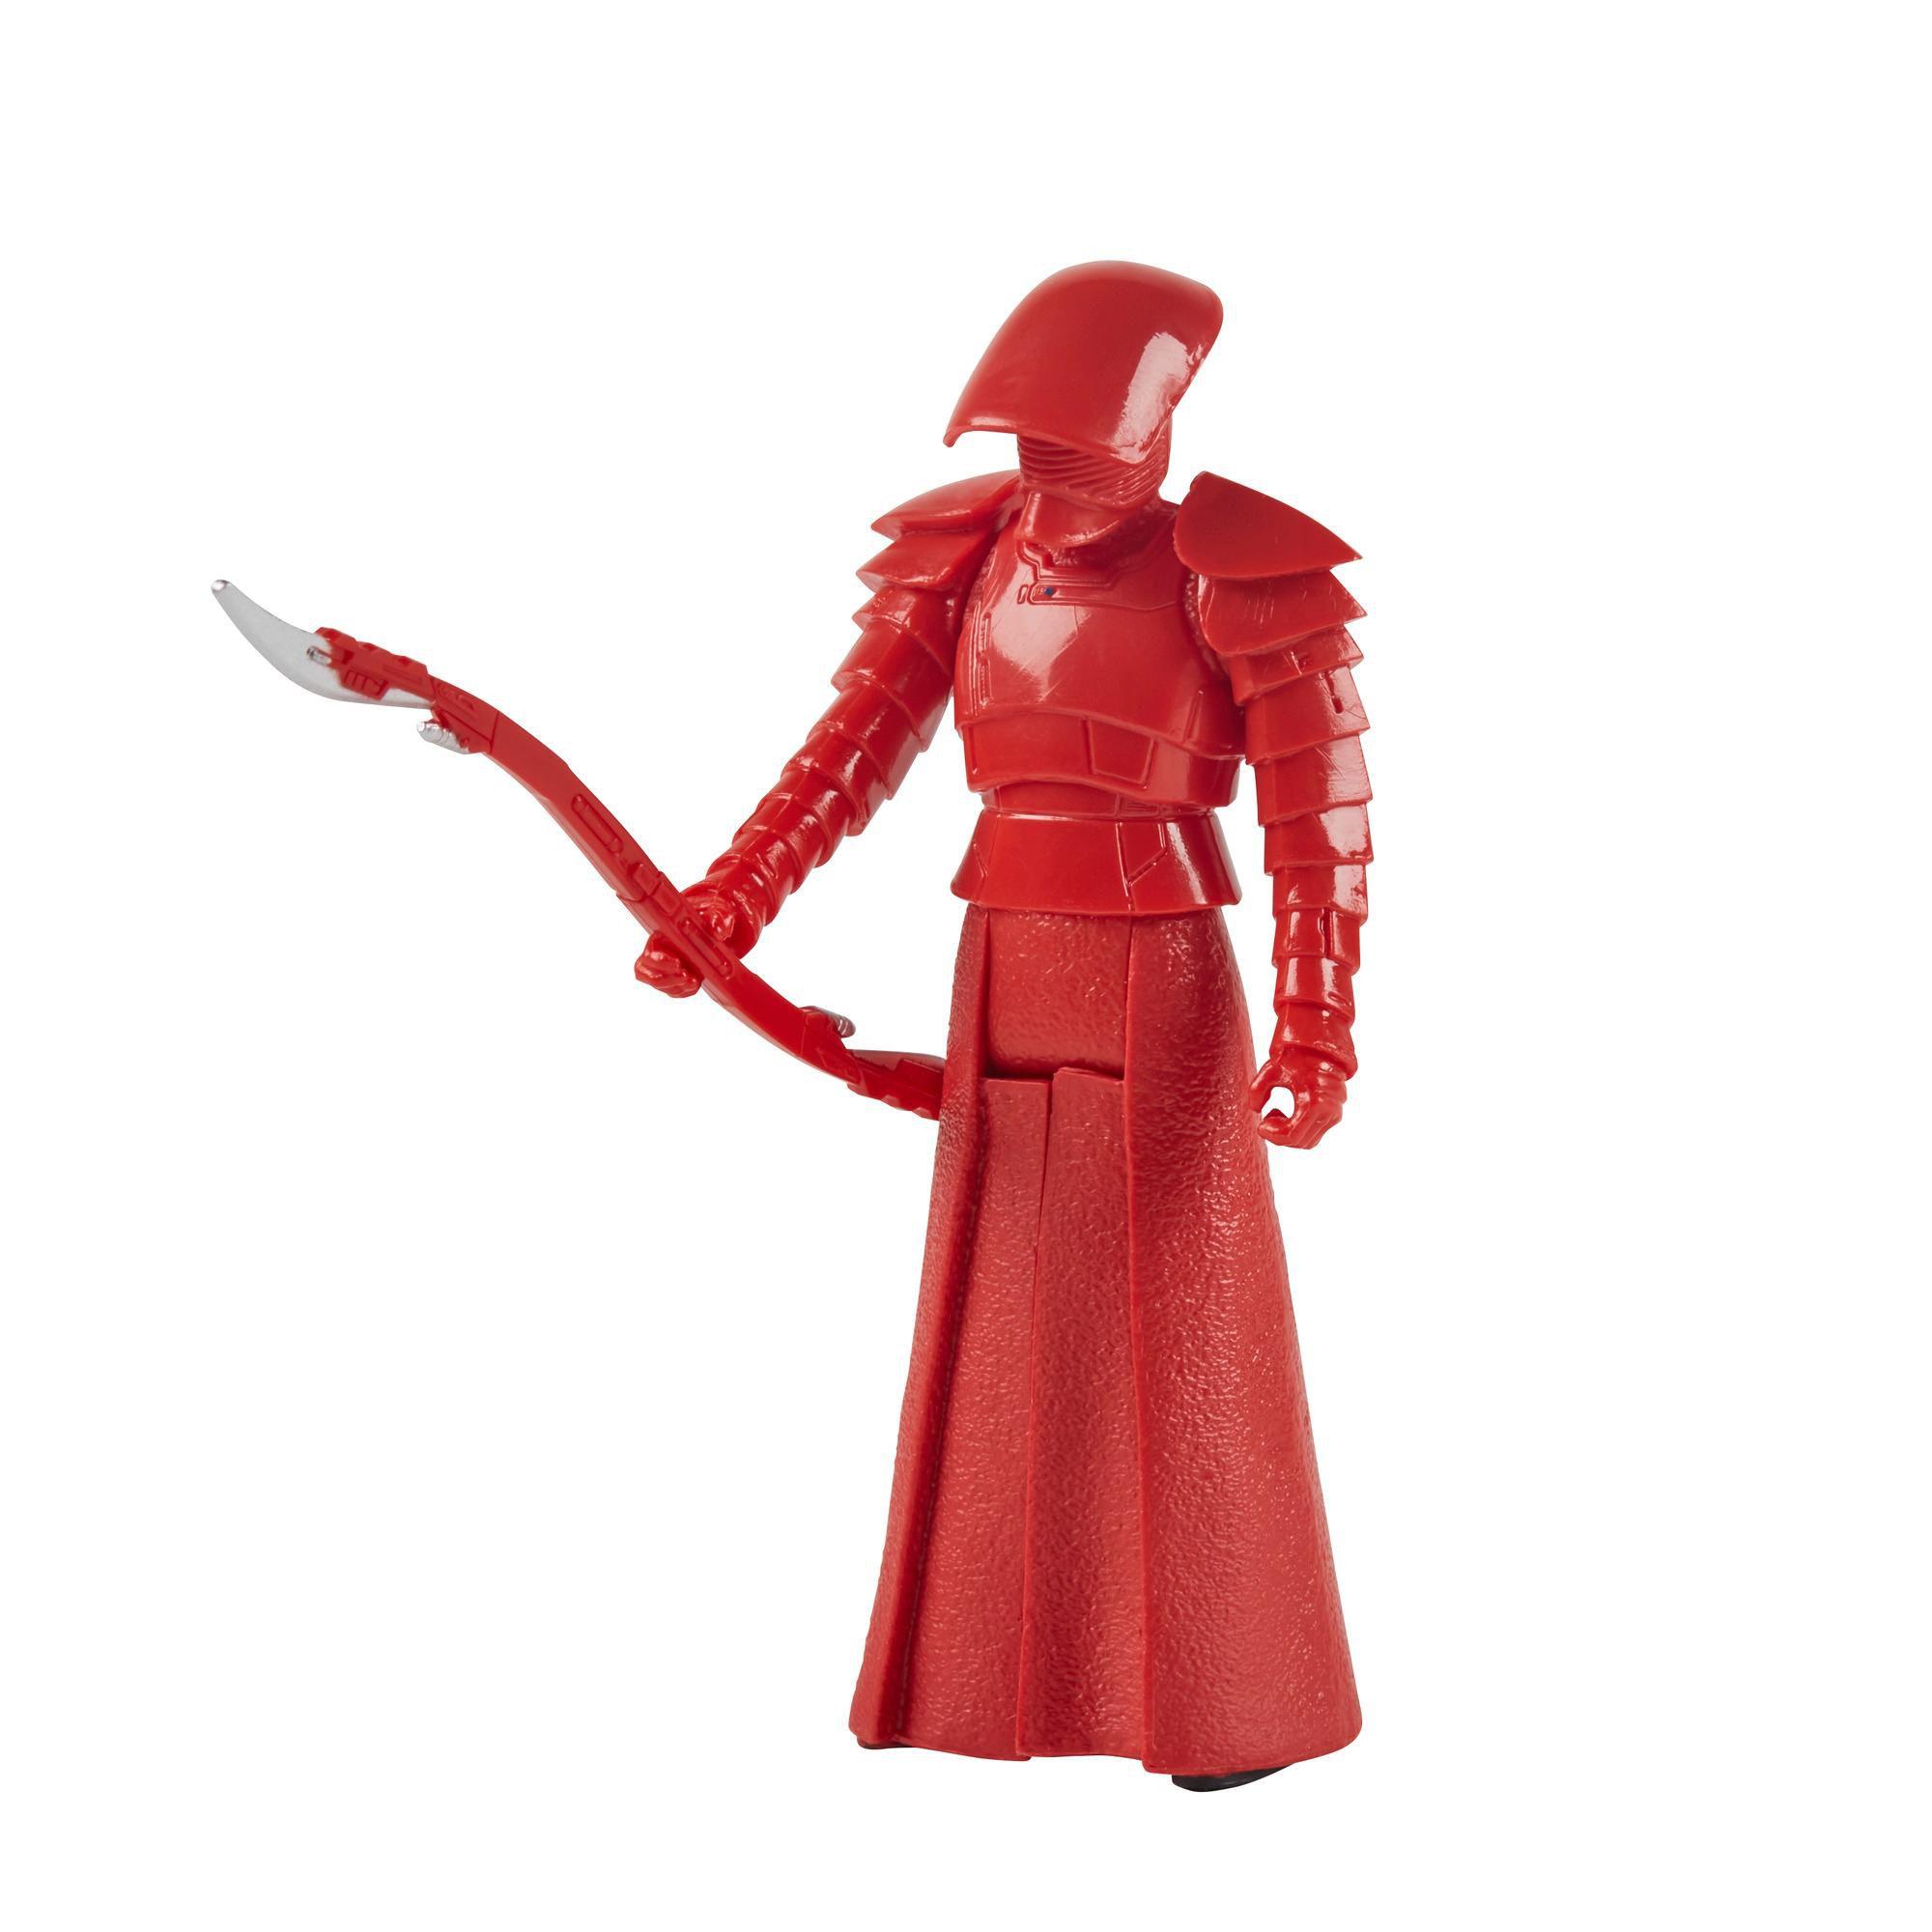 Star Wars Rey (Treinamento Jedi) e Elite Praetorian Guard 2-Force Link- Hasbro- C1242